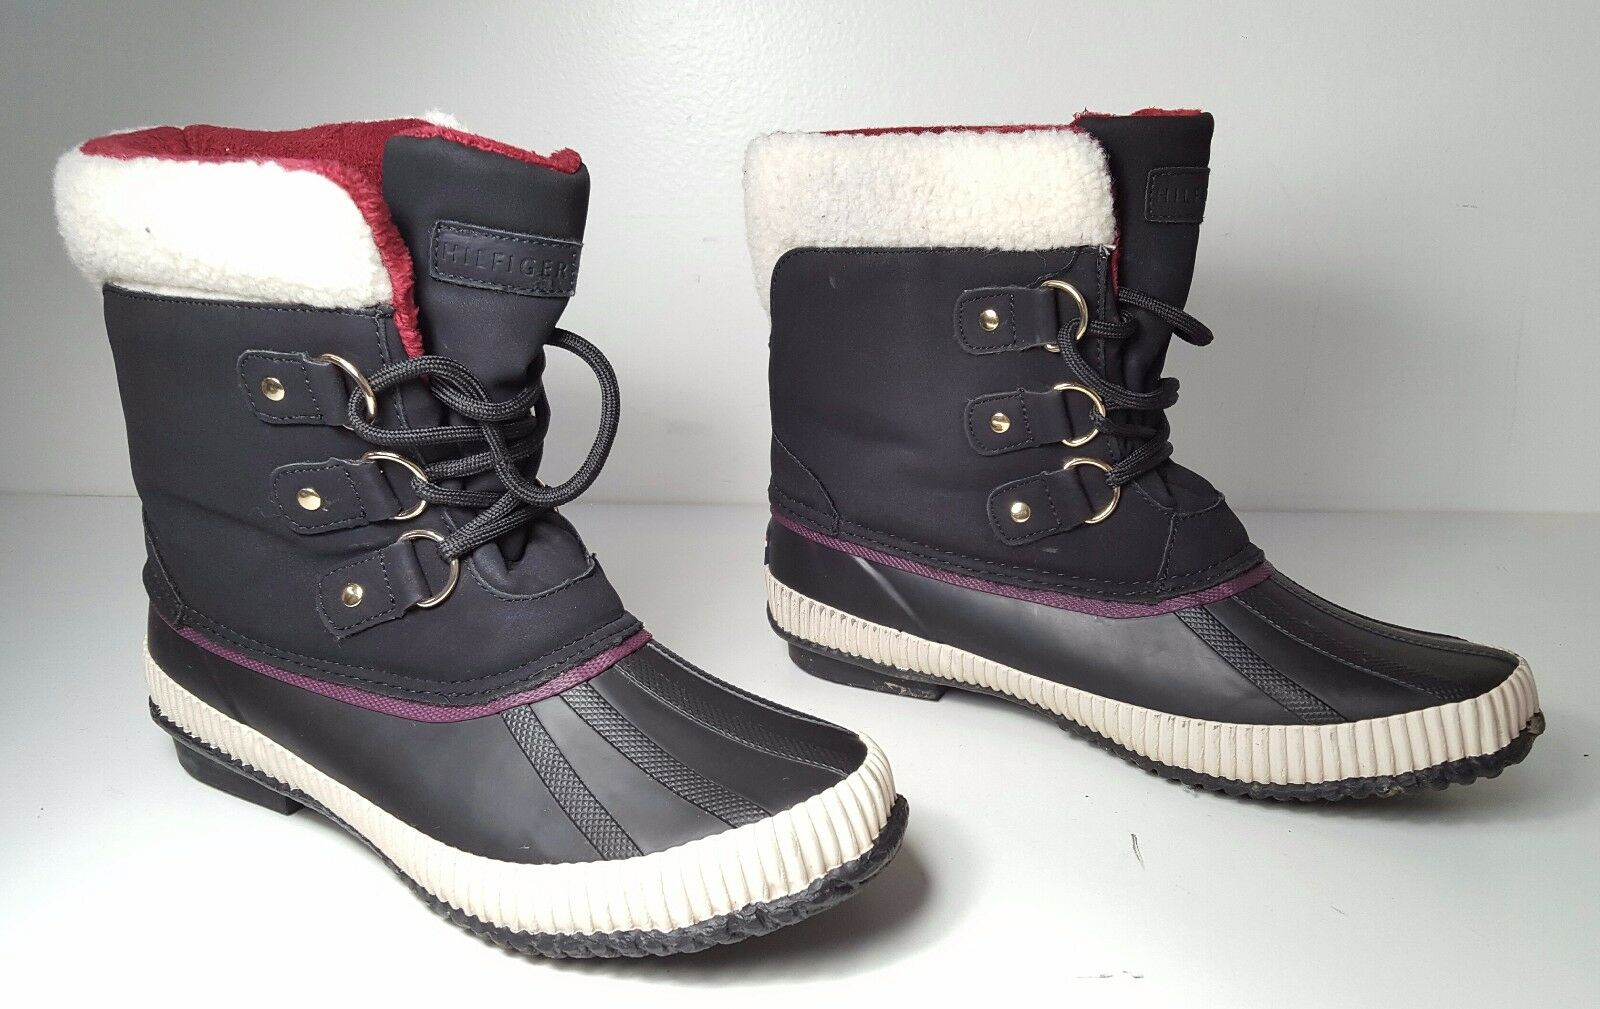 size 9 Tommy Hilfiger Ebonie Lace-Up Black lRain Rubber Duck Boots Womens Shoes